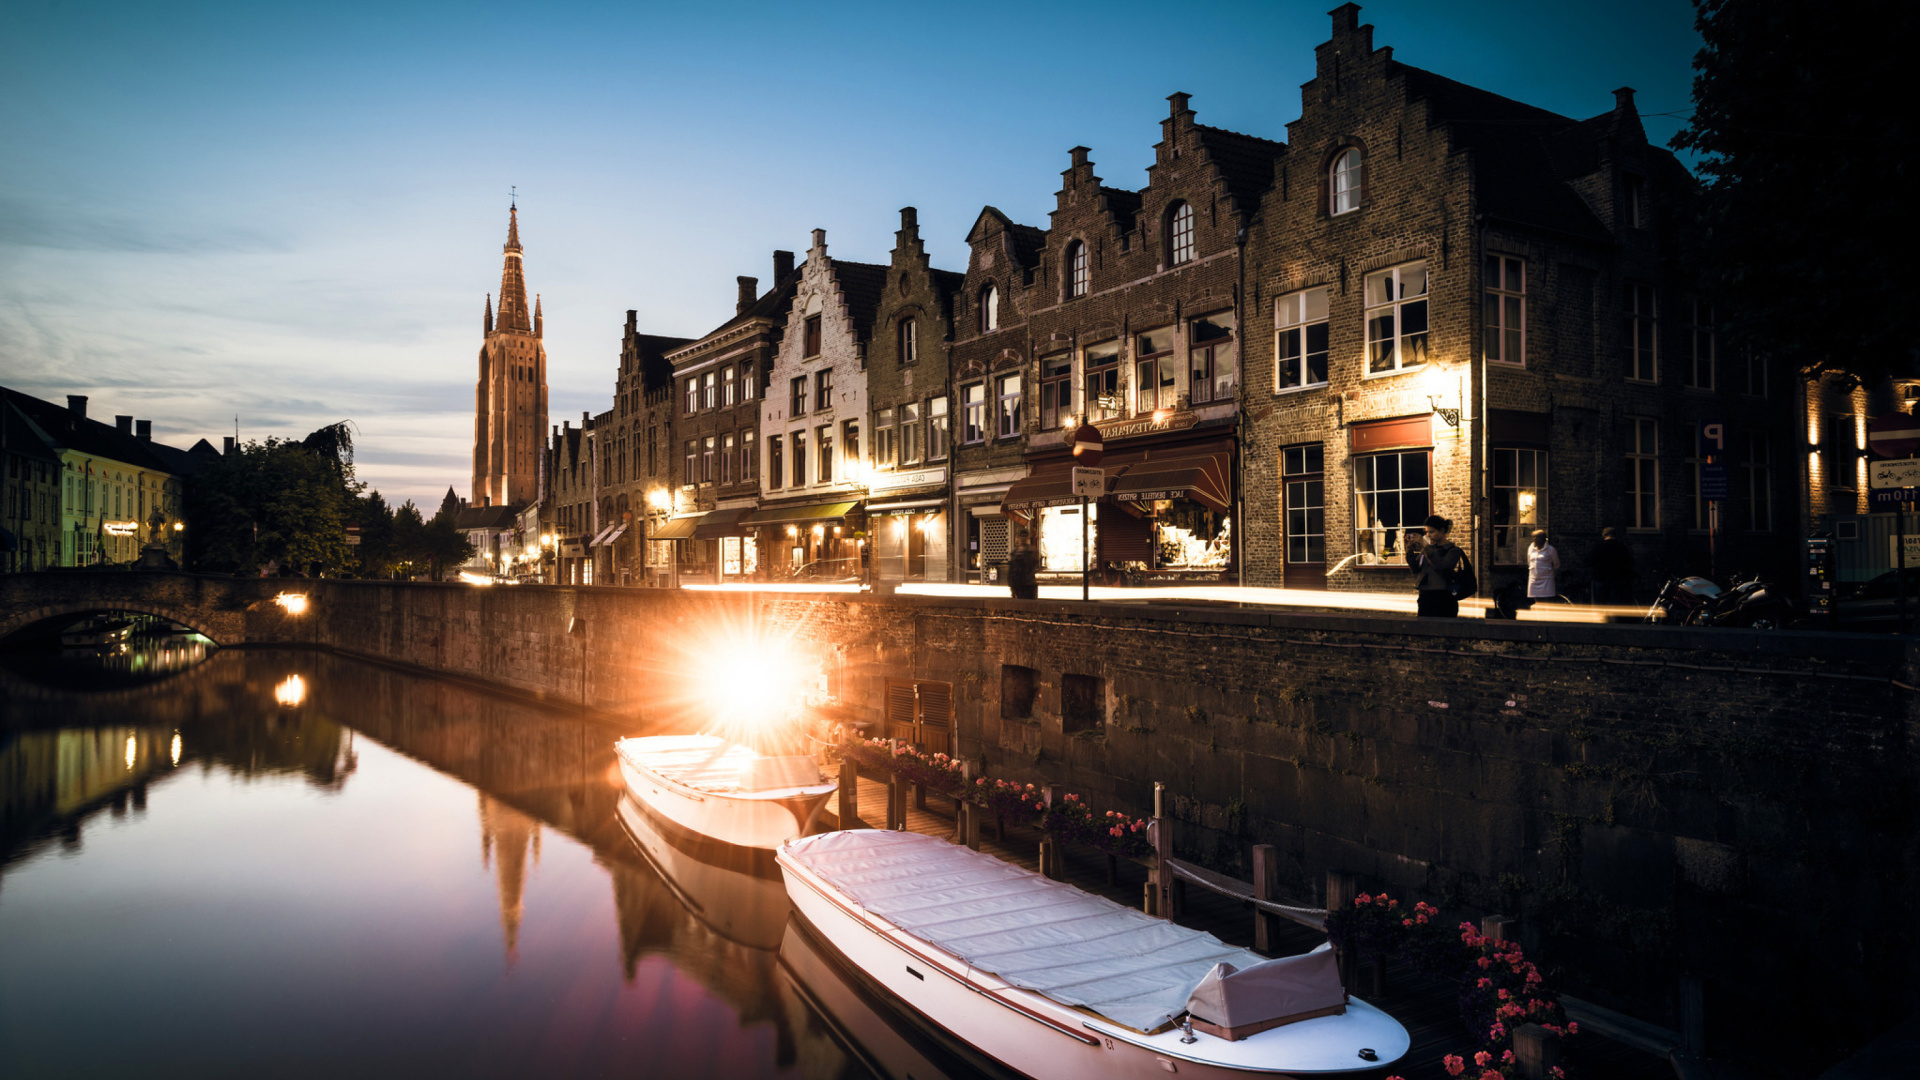 Belgium West Flanders Bruges Wallpaper For Desktop